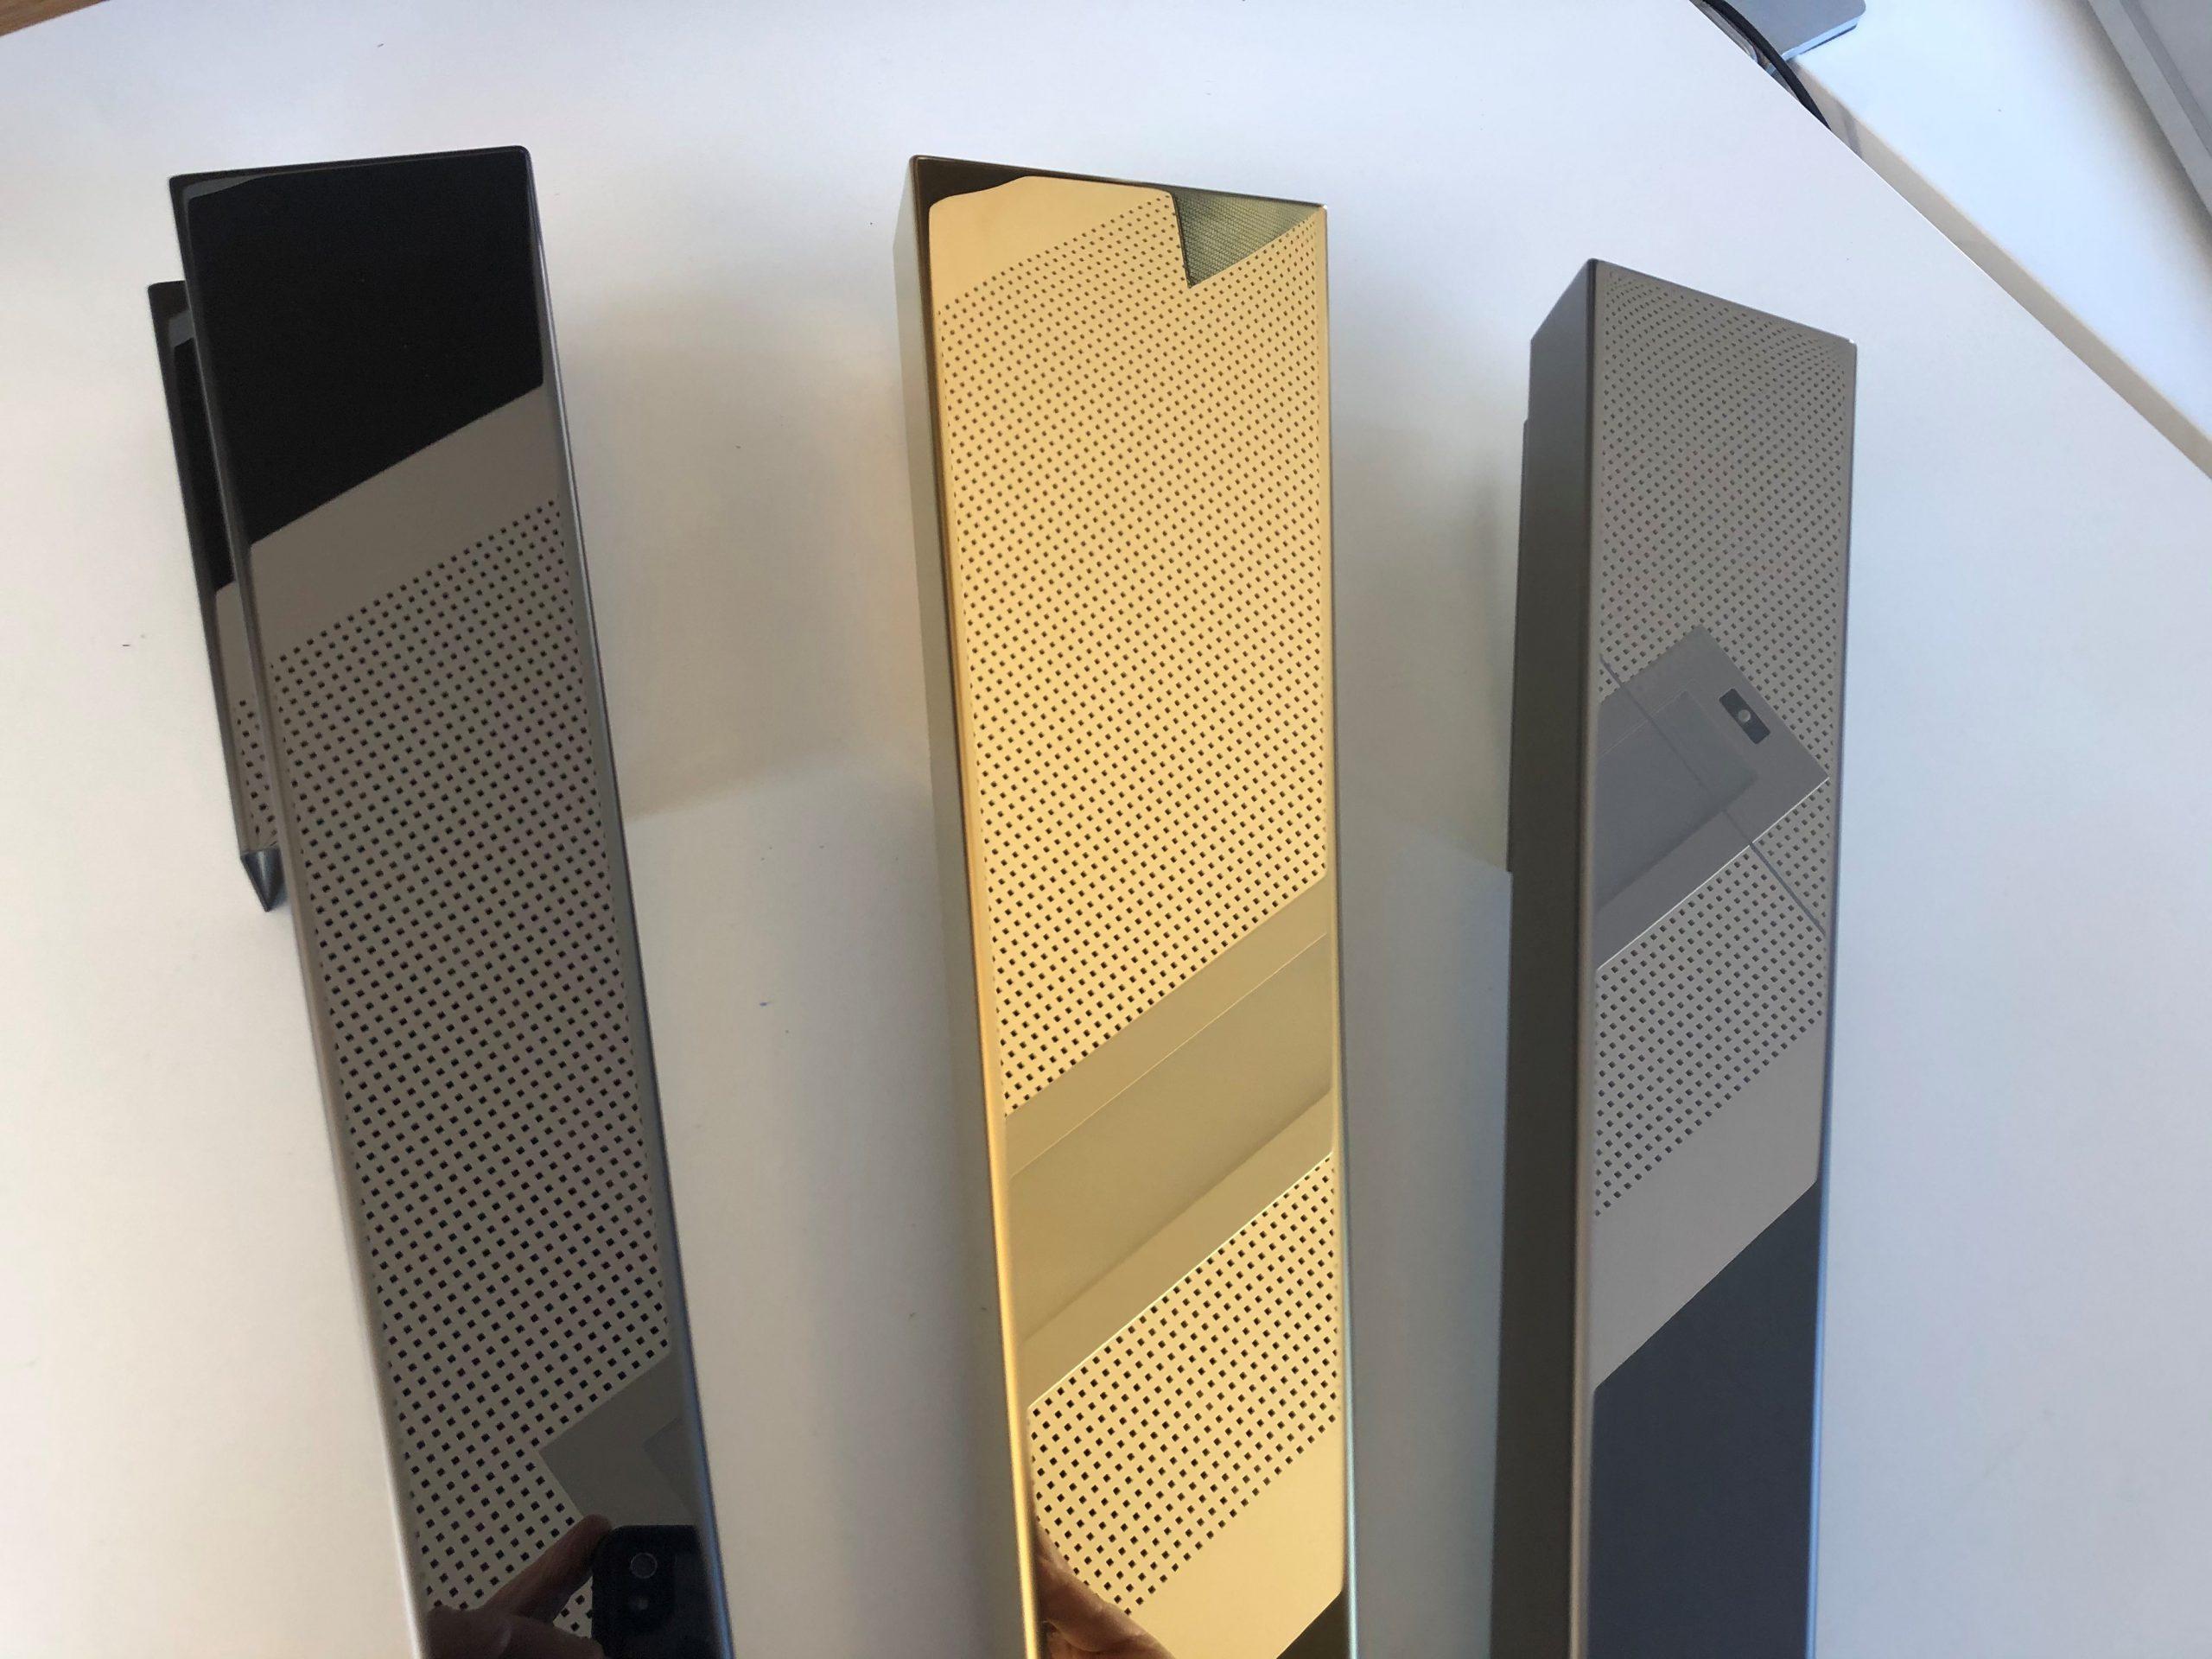 RVS black-gold mirror